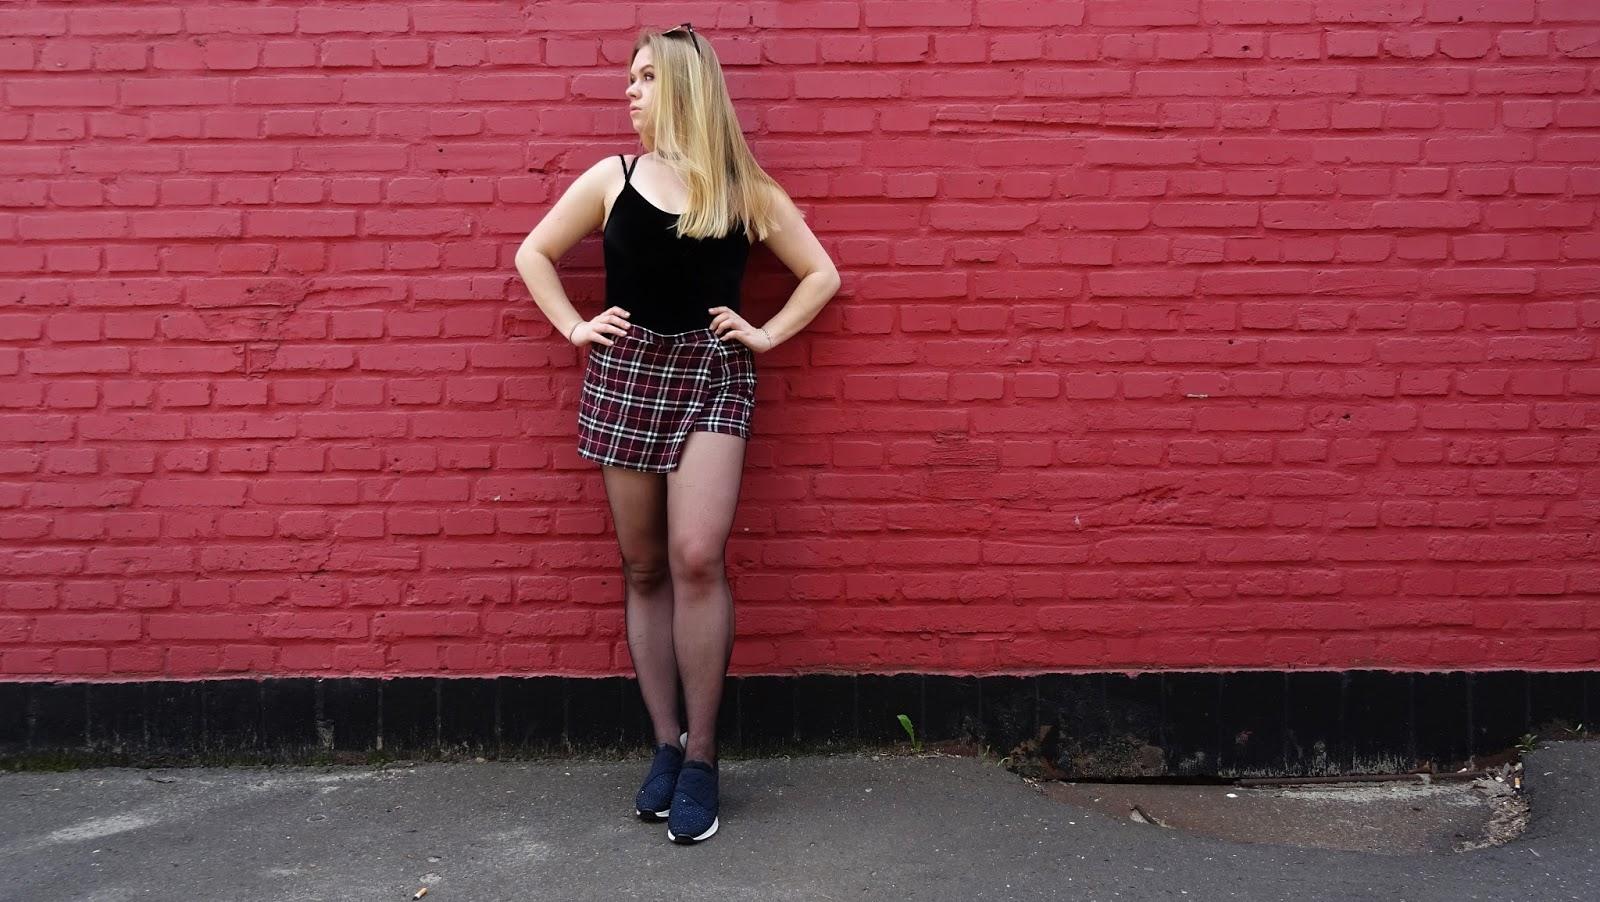 Spodenki w kratę, welurowe body, jeansowa kurtka, checked skirt, checker shorts, velvet body, jeans jacket